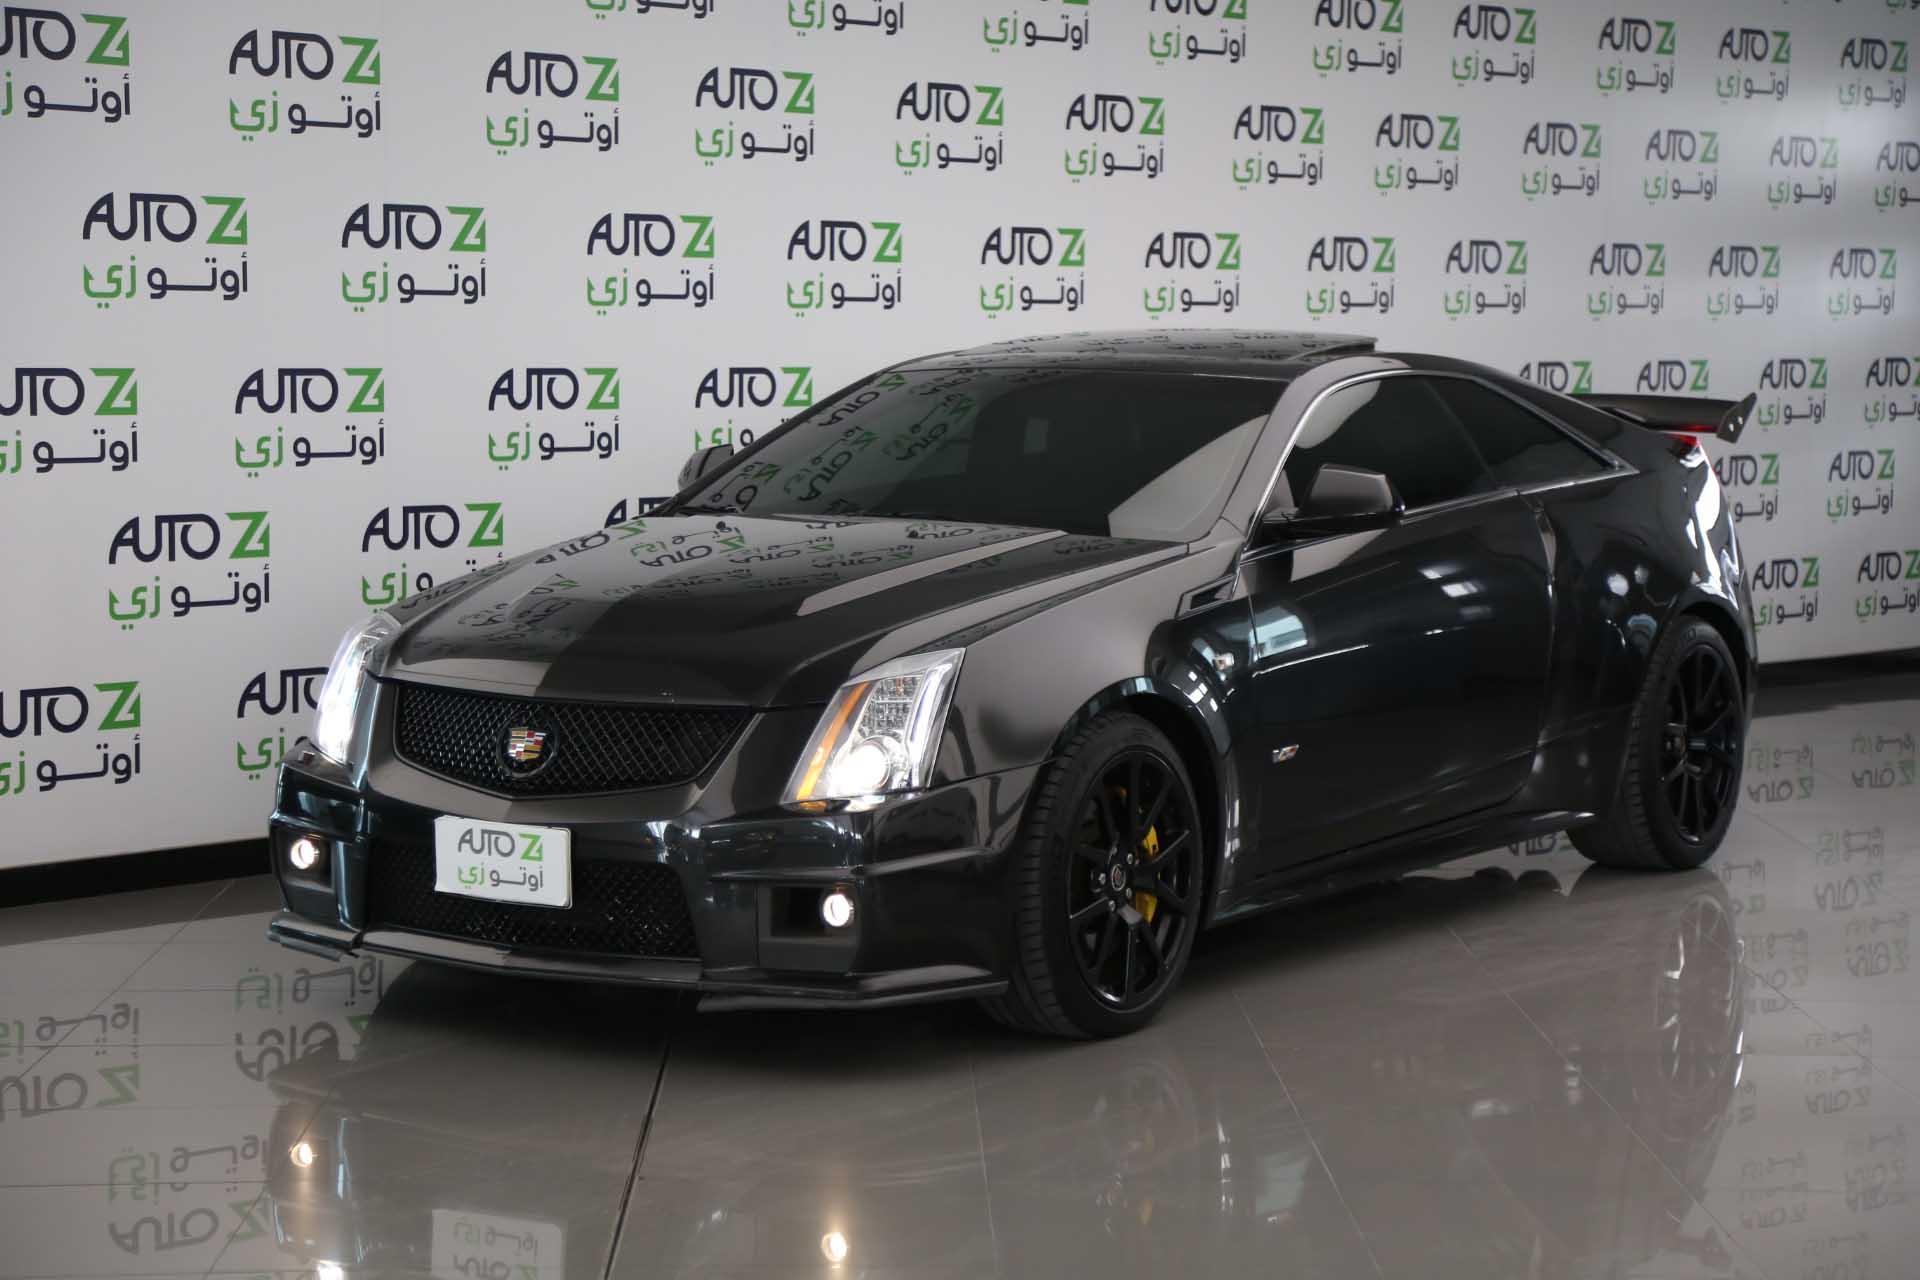 Cadillac CTS V-Supercharger 2012